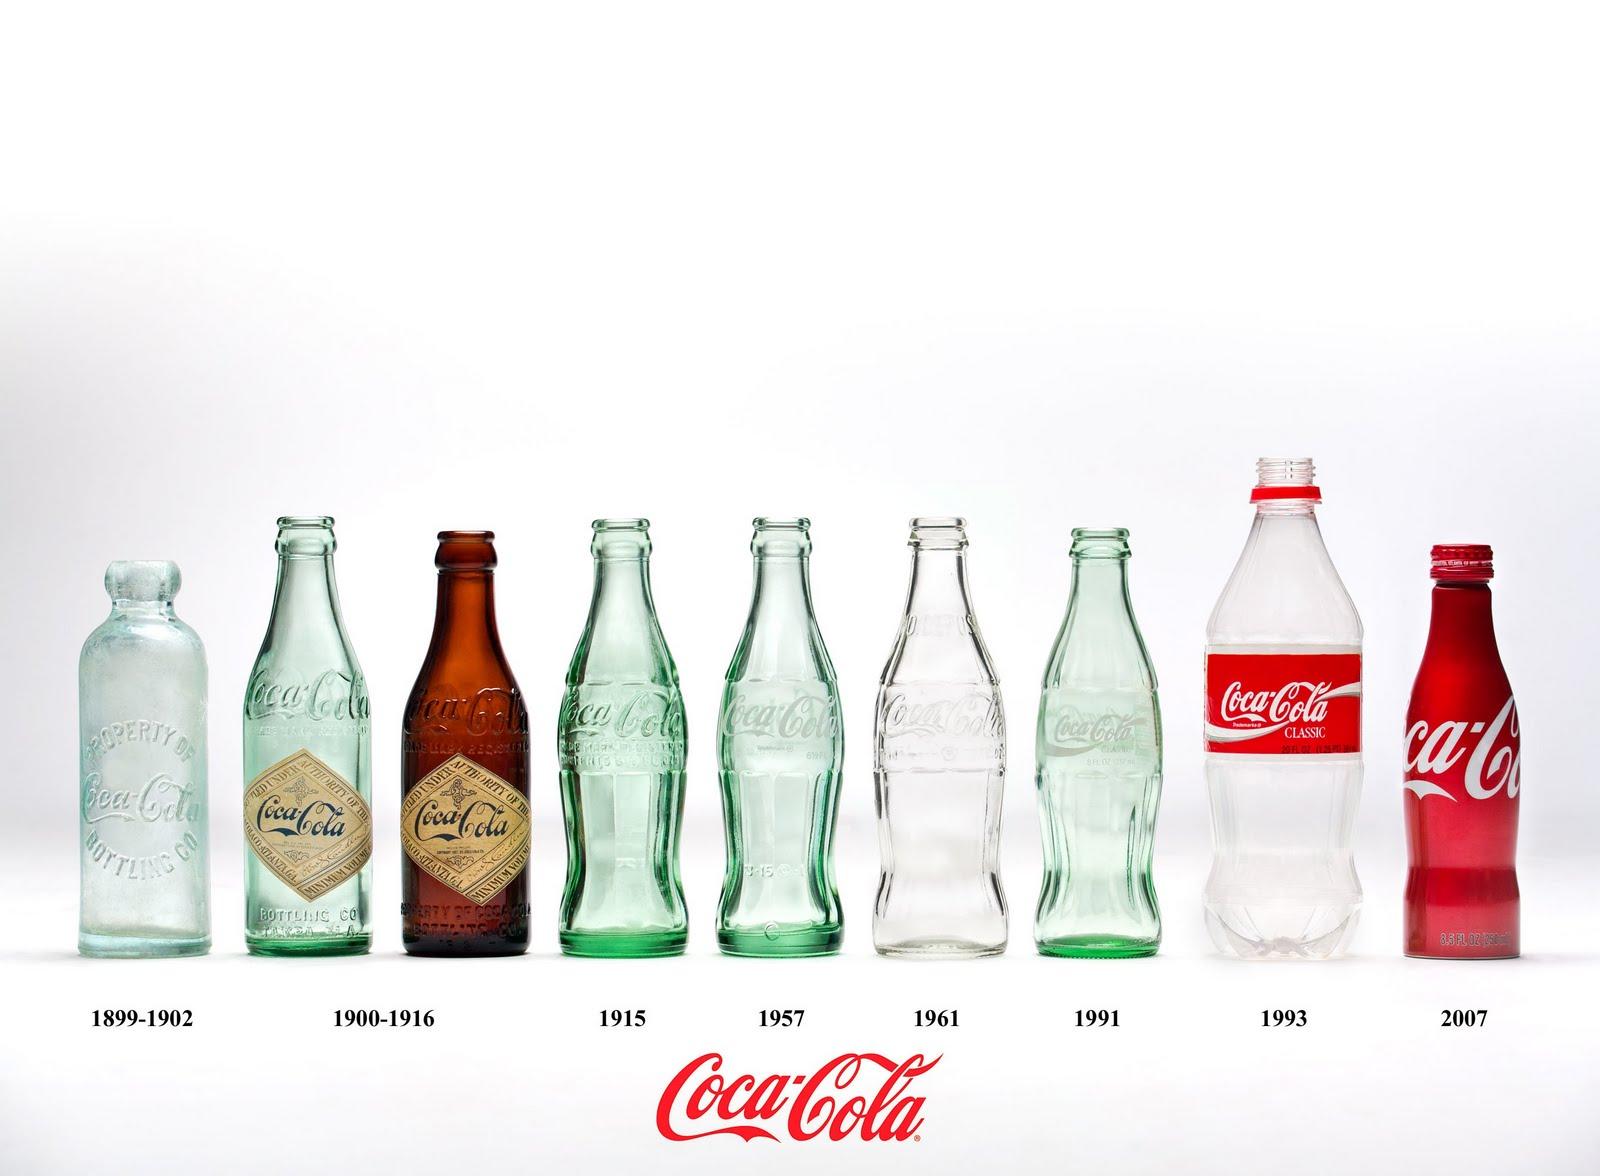 http://3.bp.blogspot.com/-4Lssyoev2UQ/TcPXht6KT9I/AAAAAAAAAzc/ZzfKuAGmurQ/s1600/bottle_chronology.jpg